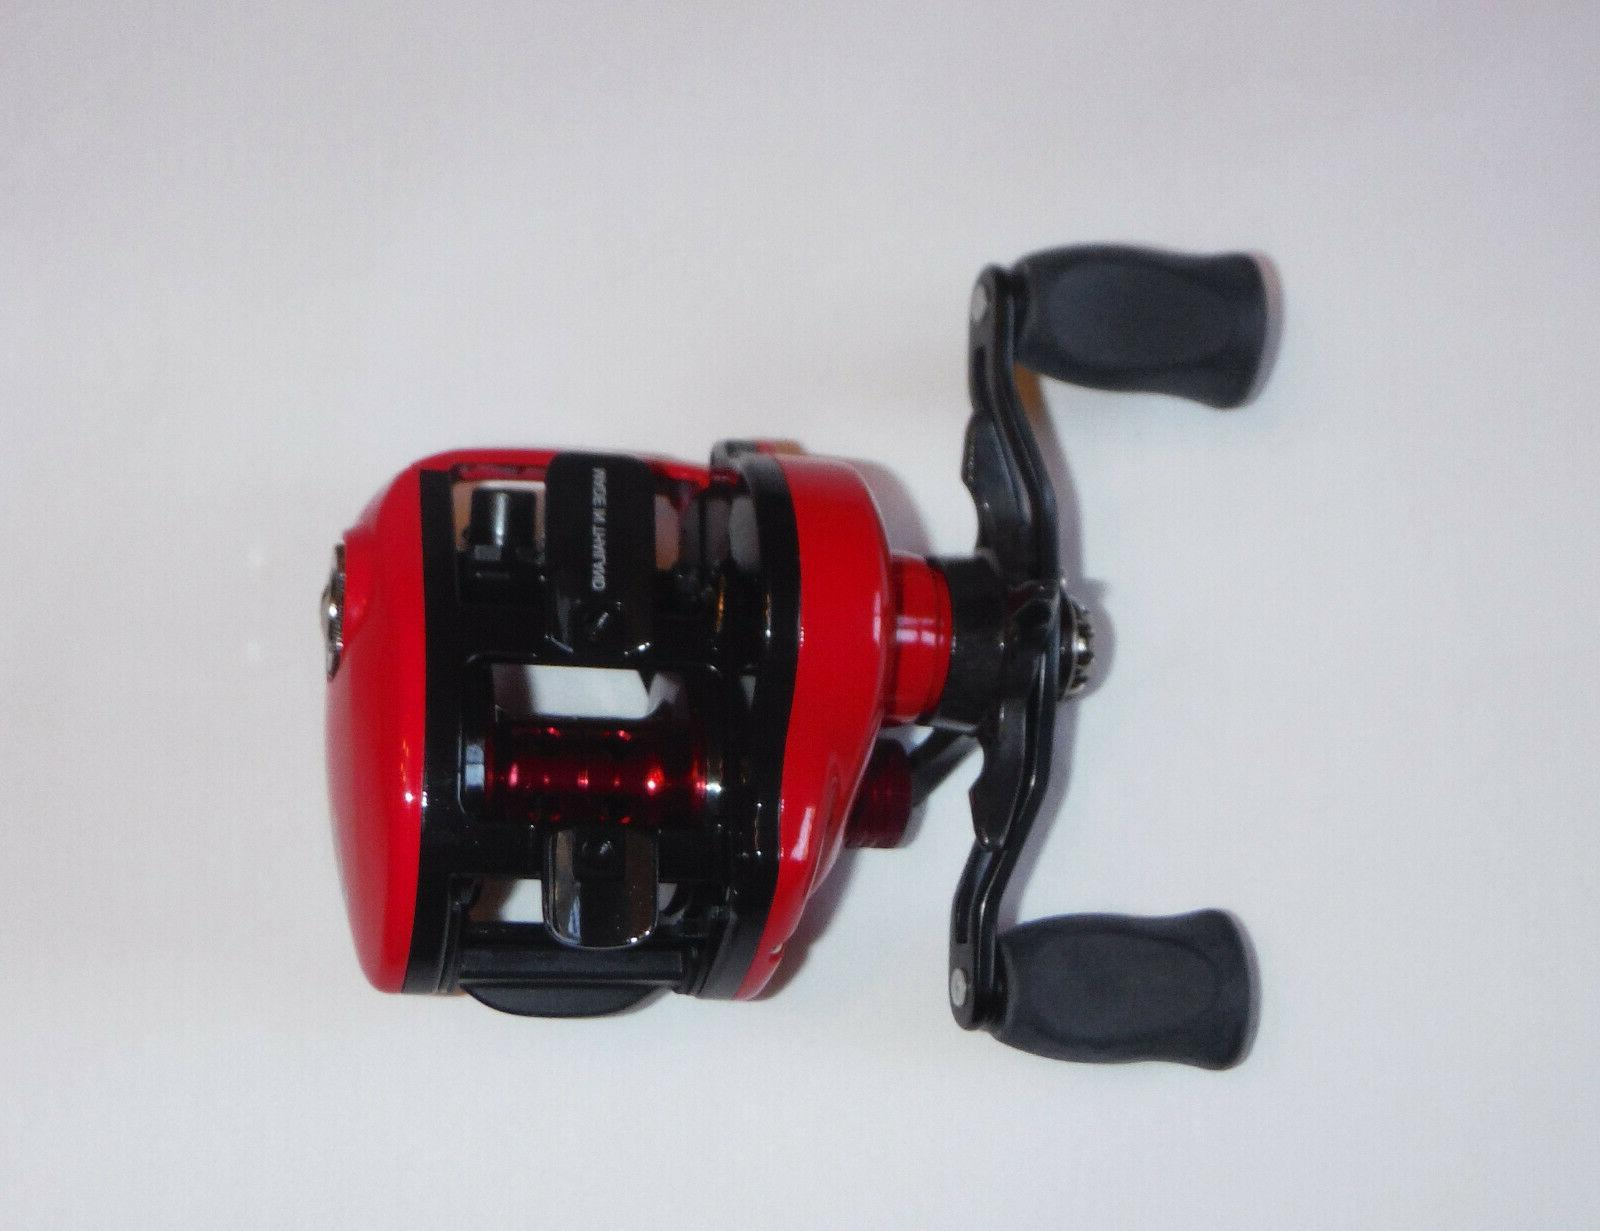 Daiwa Tatula Red Limited Edition Baitcasting